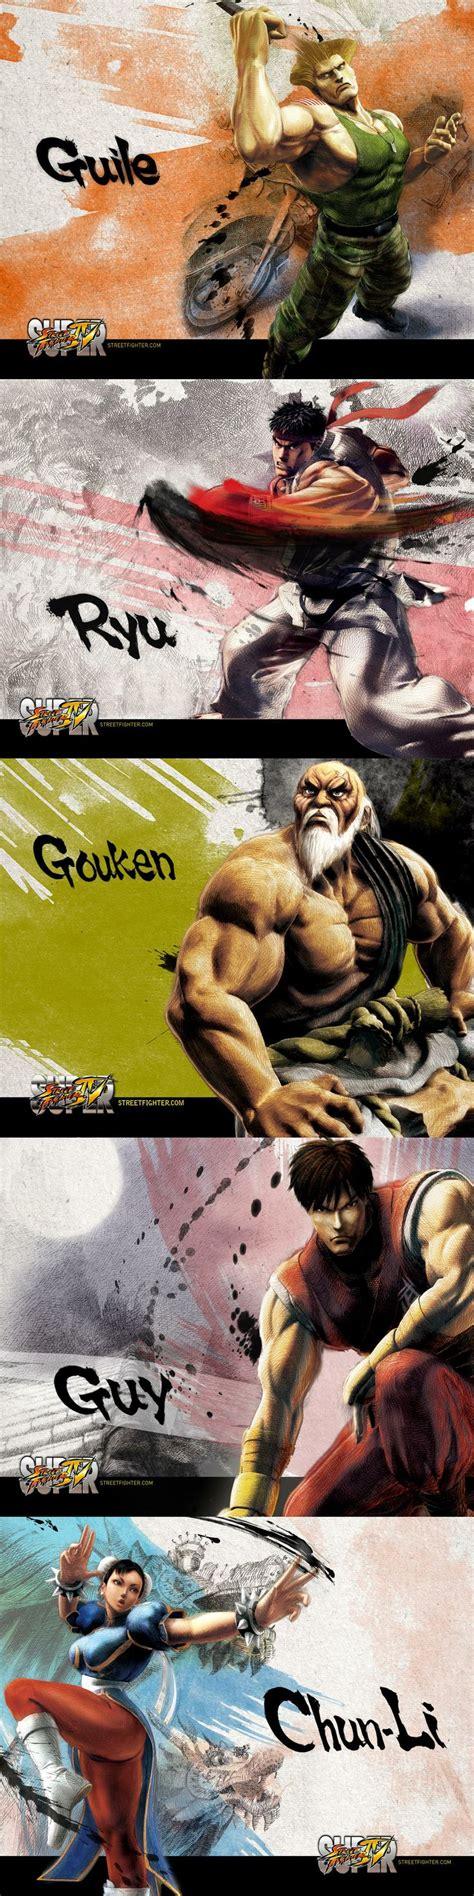 Tshirt Mortal Kombat Iv 17 best images about mortal kombat on